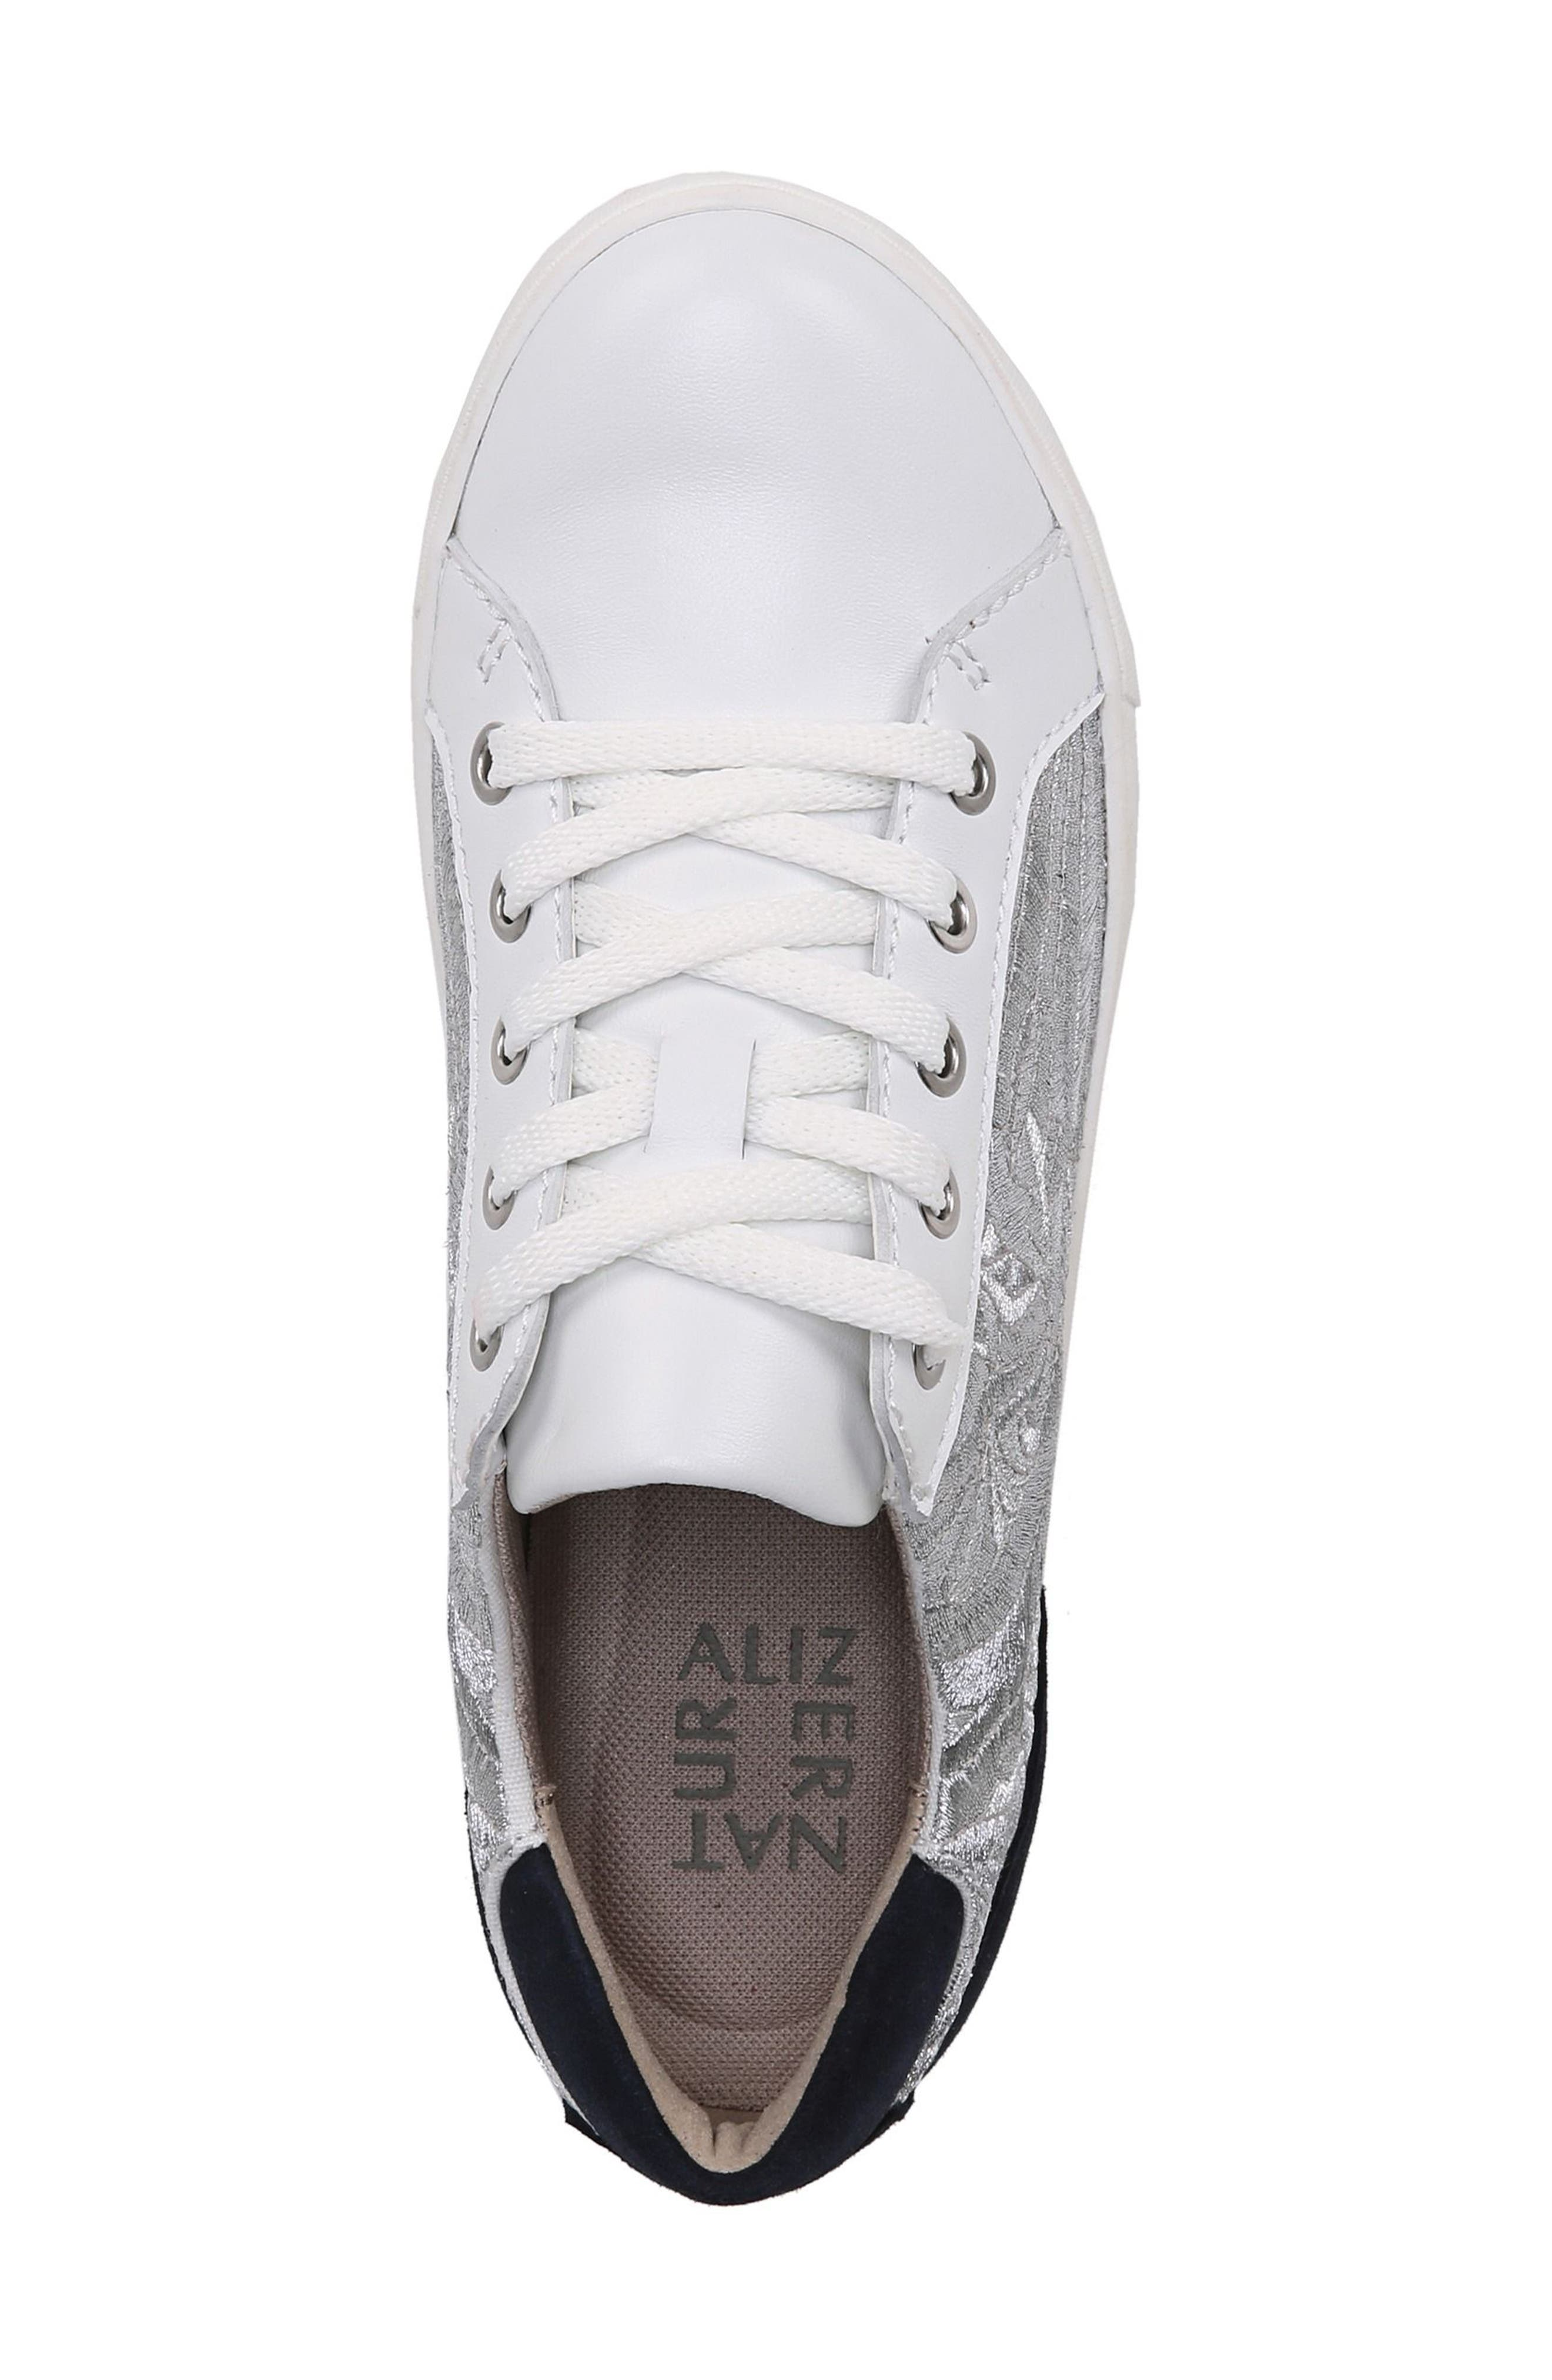 Morrison Sneaker,                             Alternate thumbnail 3, color,                             White/ Silver Leather